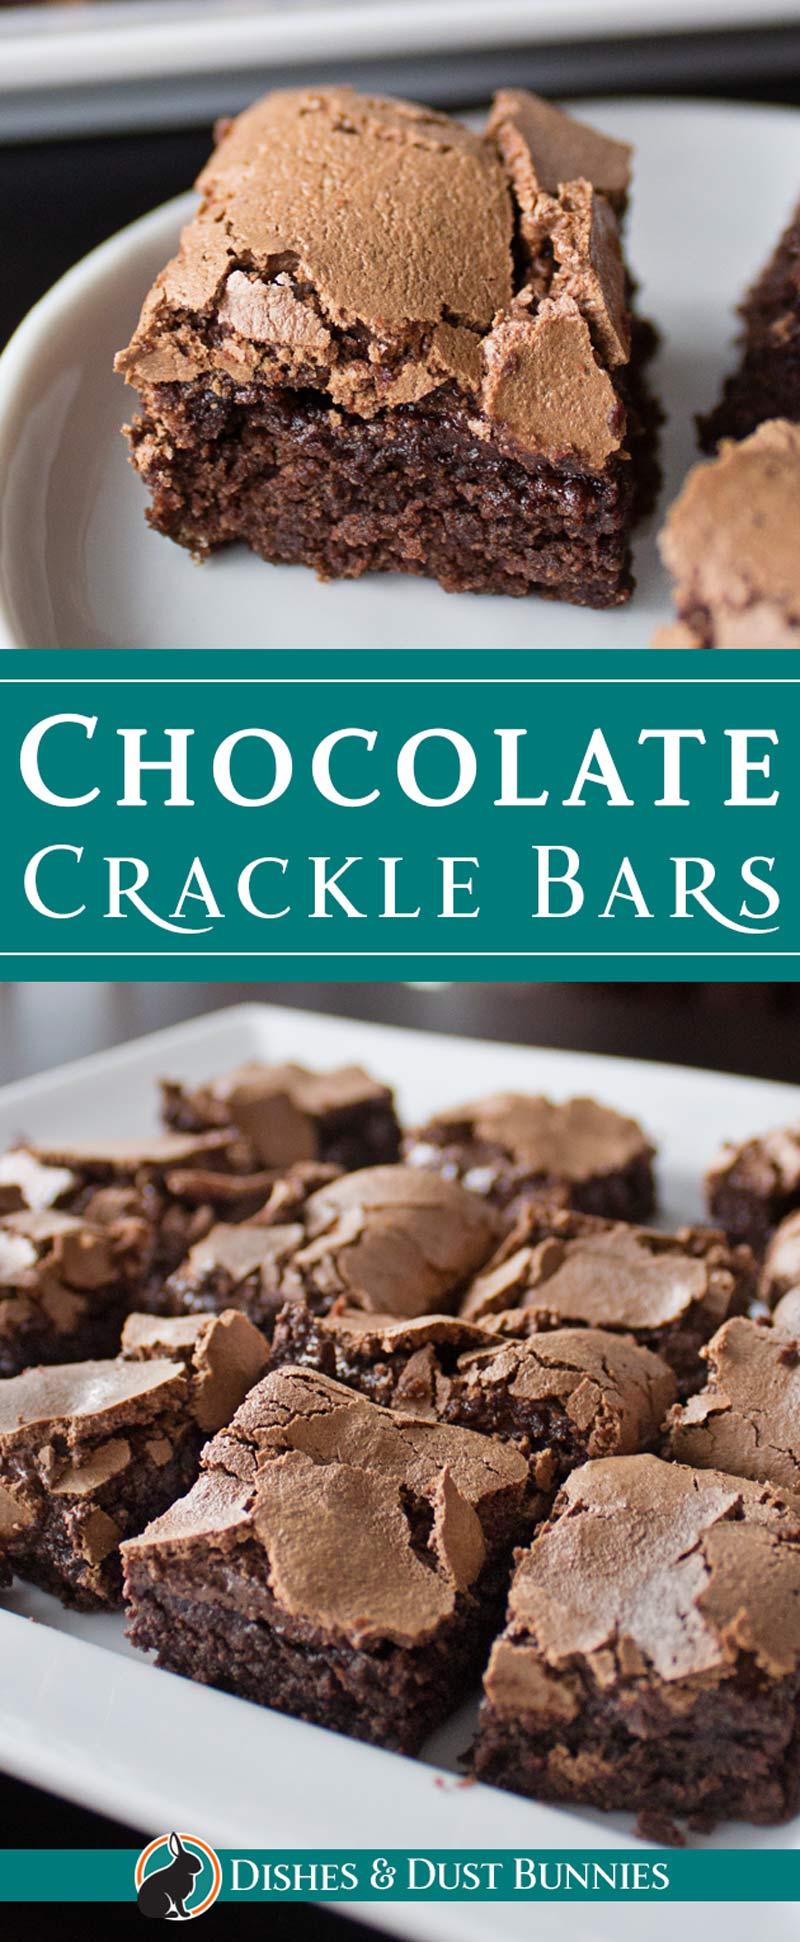 Chocolate Crackle Bars from dishesanddustbunnies.com